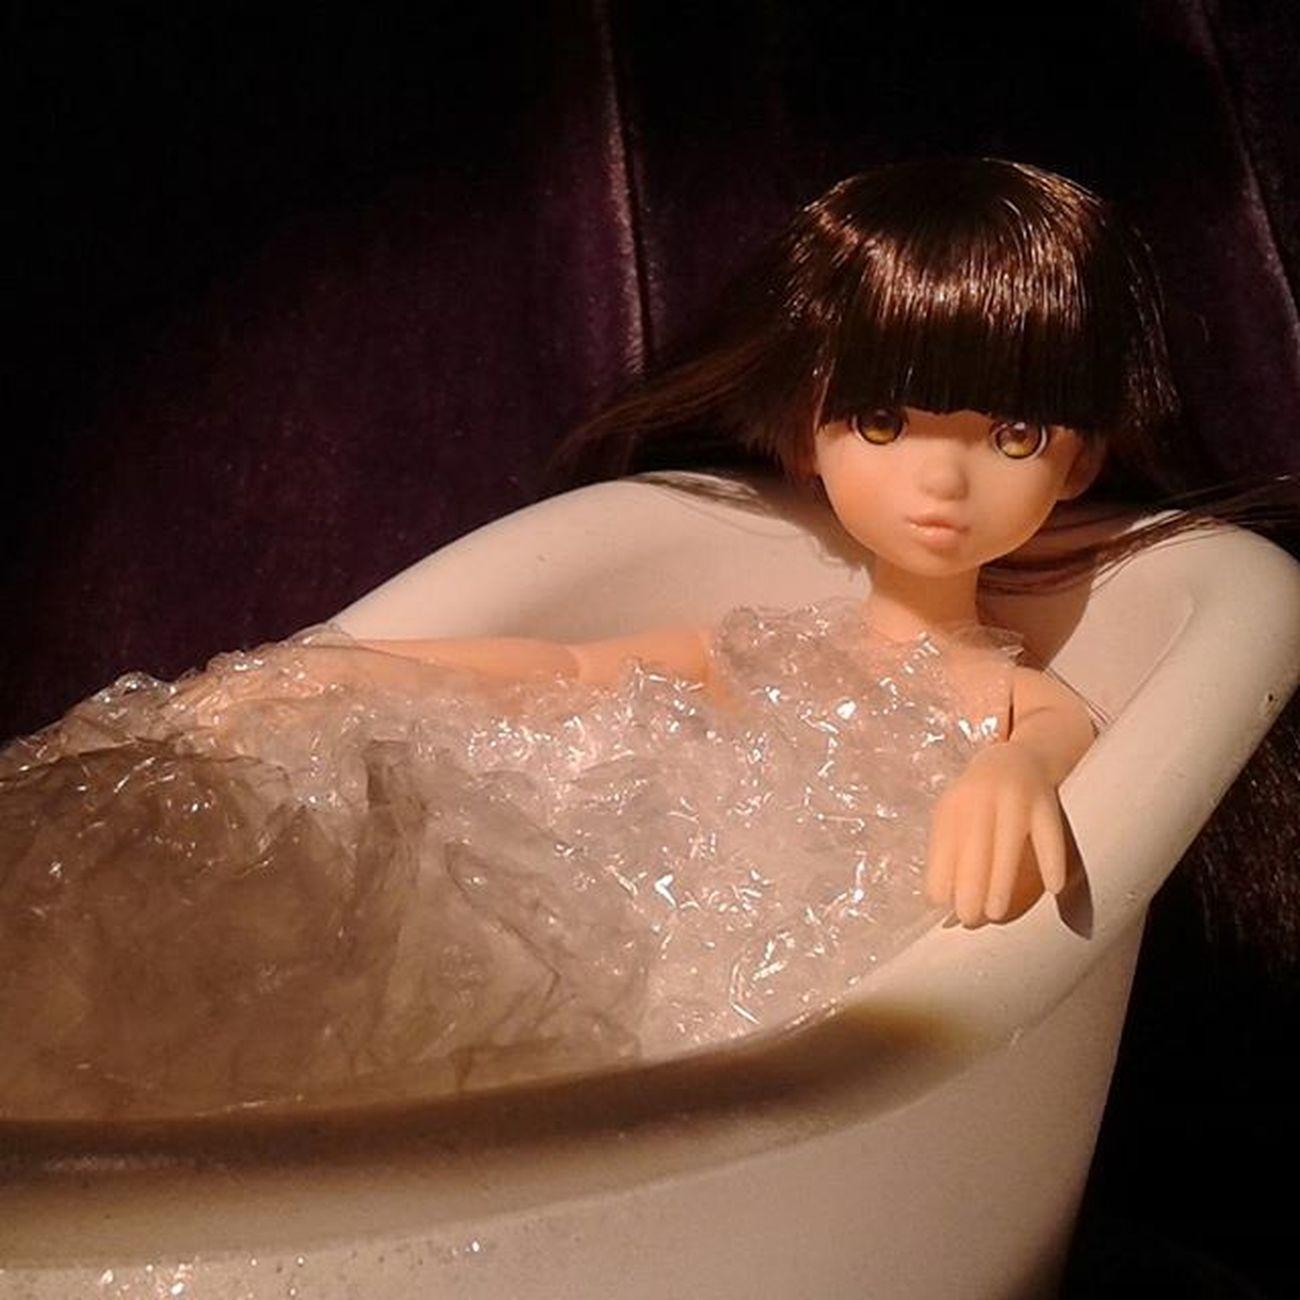 After Dance class, Ruruko cools down in the bath.... **************** Doll Dolls Dollstagram Dollphotogallery DollPhotography Toy Toys Toygroup_alliance Toyartistry Toyphotogallery Toyphotography Toyunion Toyplanet Toys4life Toyslagram Toyrevolution Toycrewbuddies Petworks Toycrewbuddiesjp Japan Nippon Sekiguchi Rurukodoll